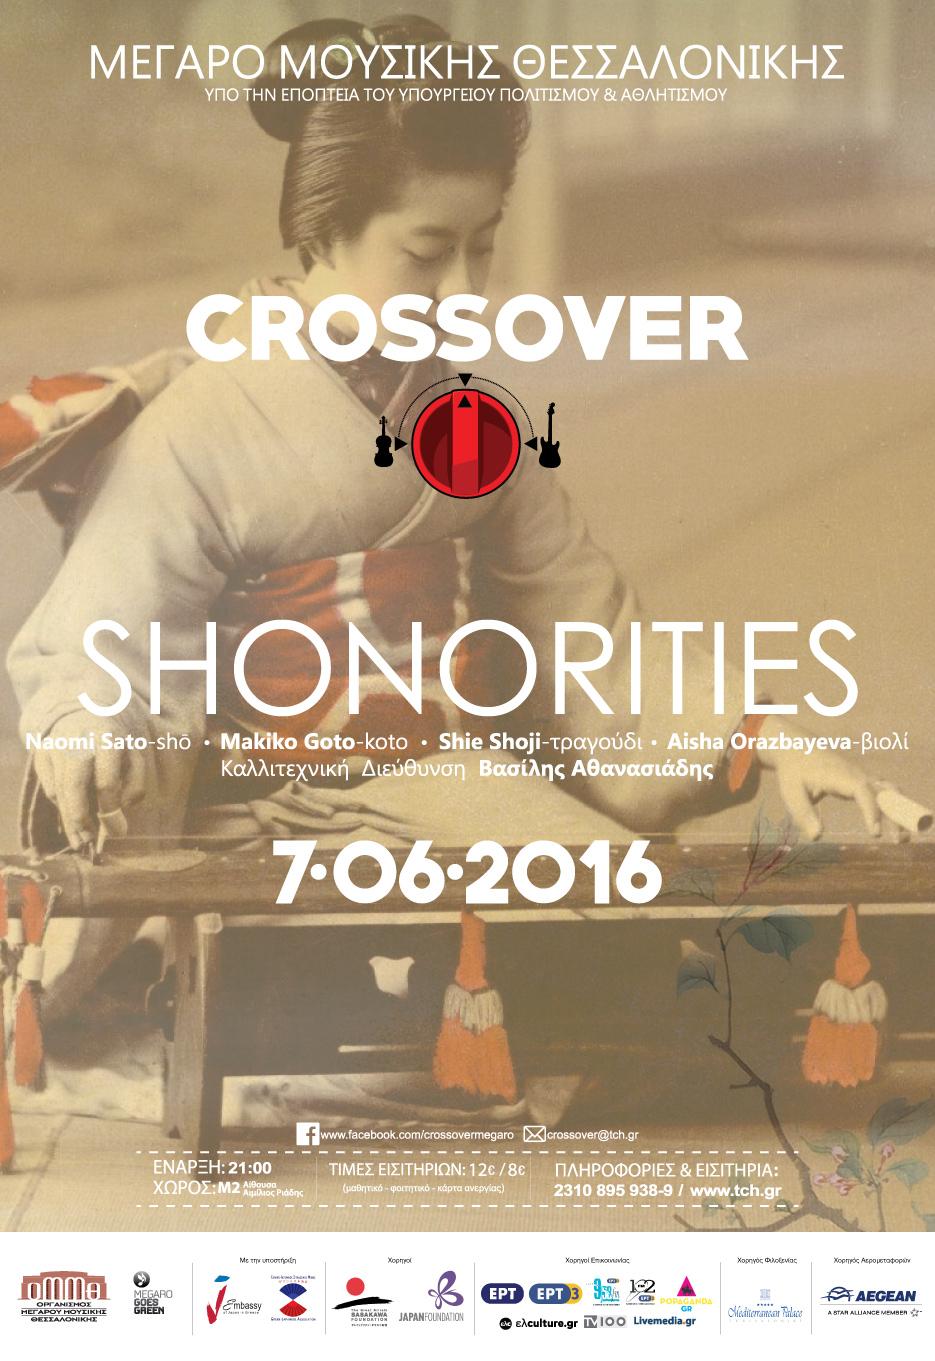 Shonorites (1) (2)